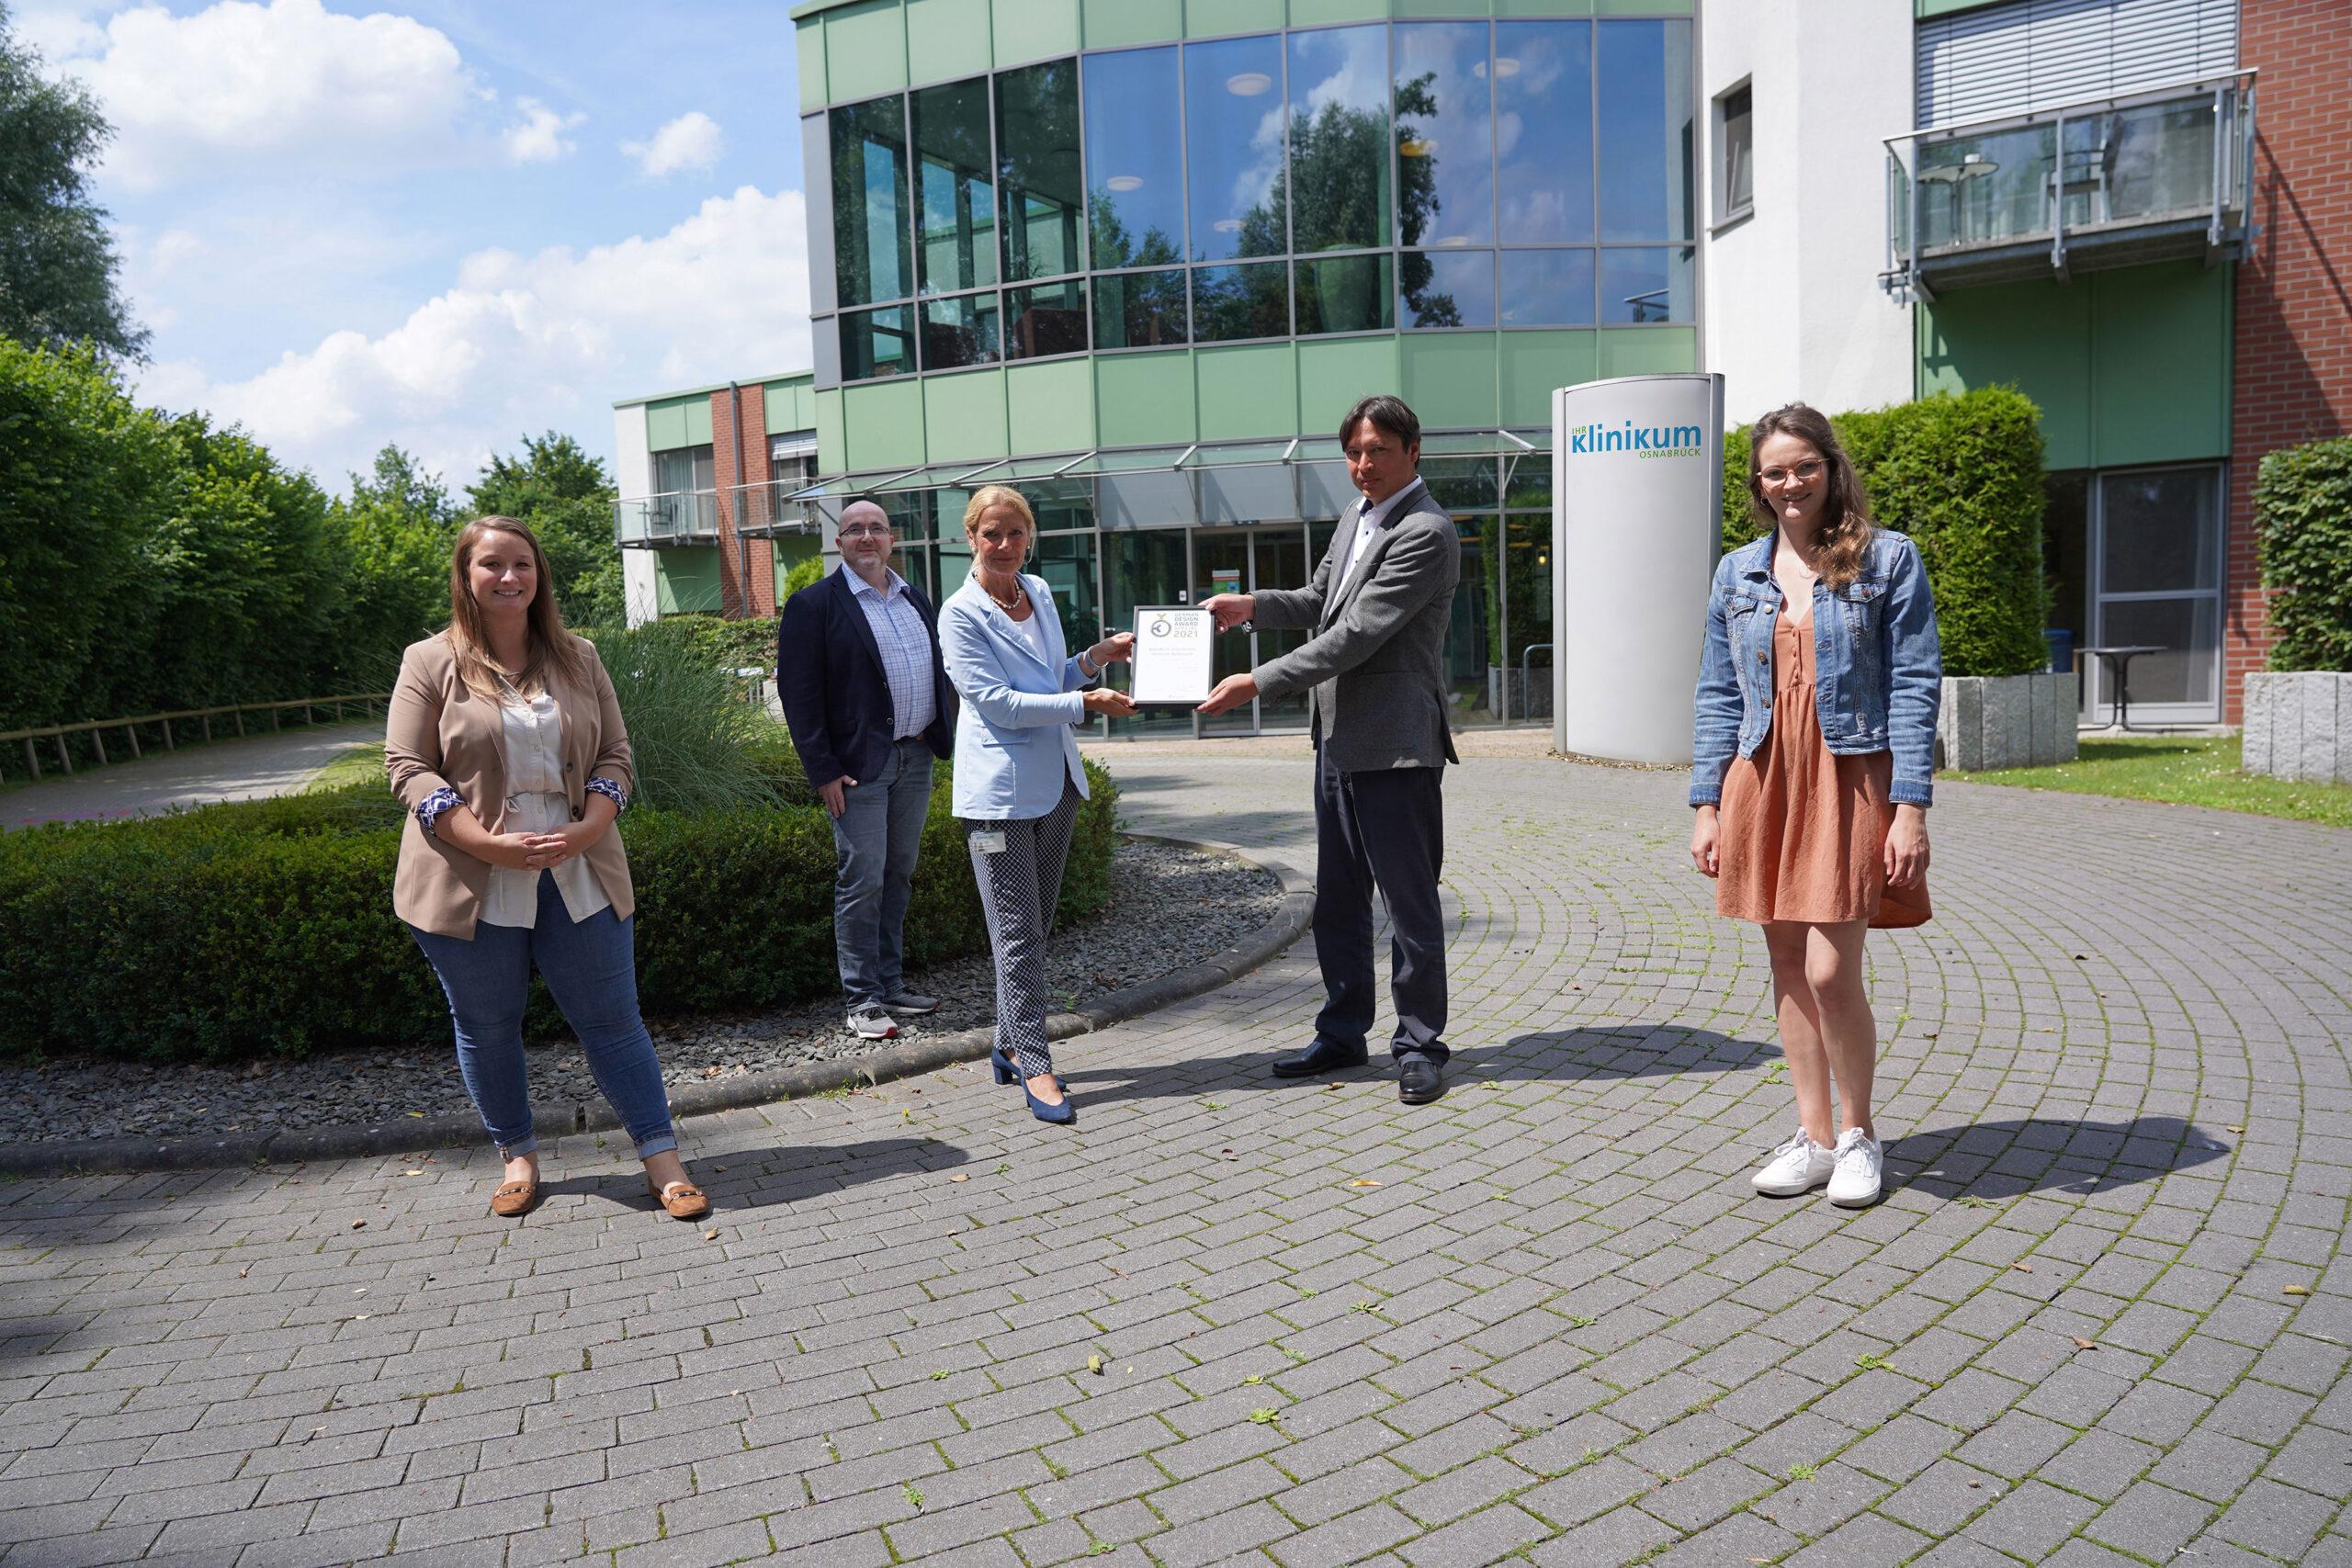 team4media erhält German Design Award 2021 für den Websiterelaunch des Klinikum Osnabrück